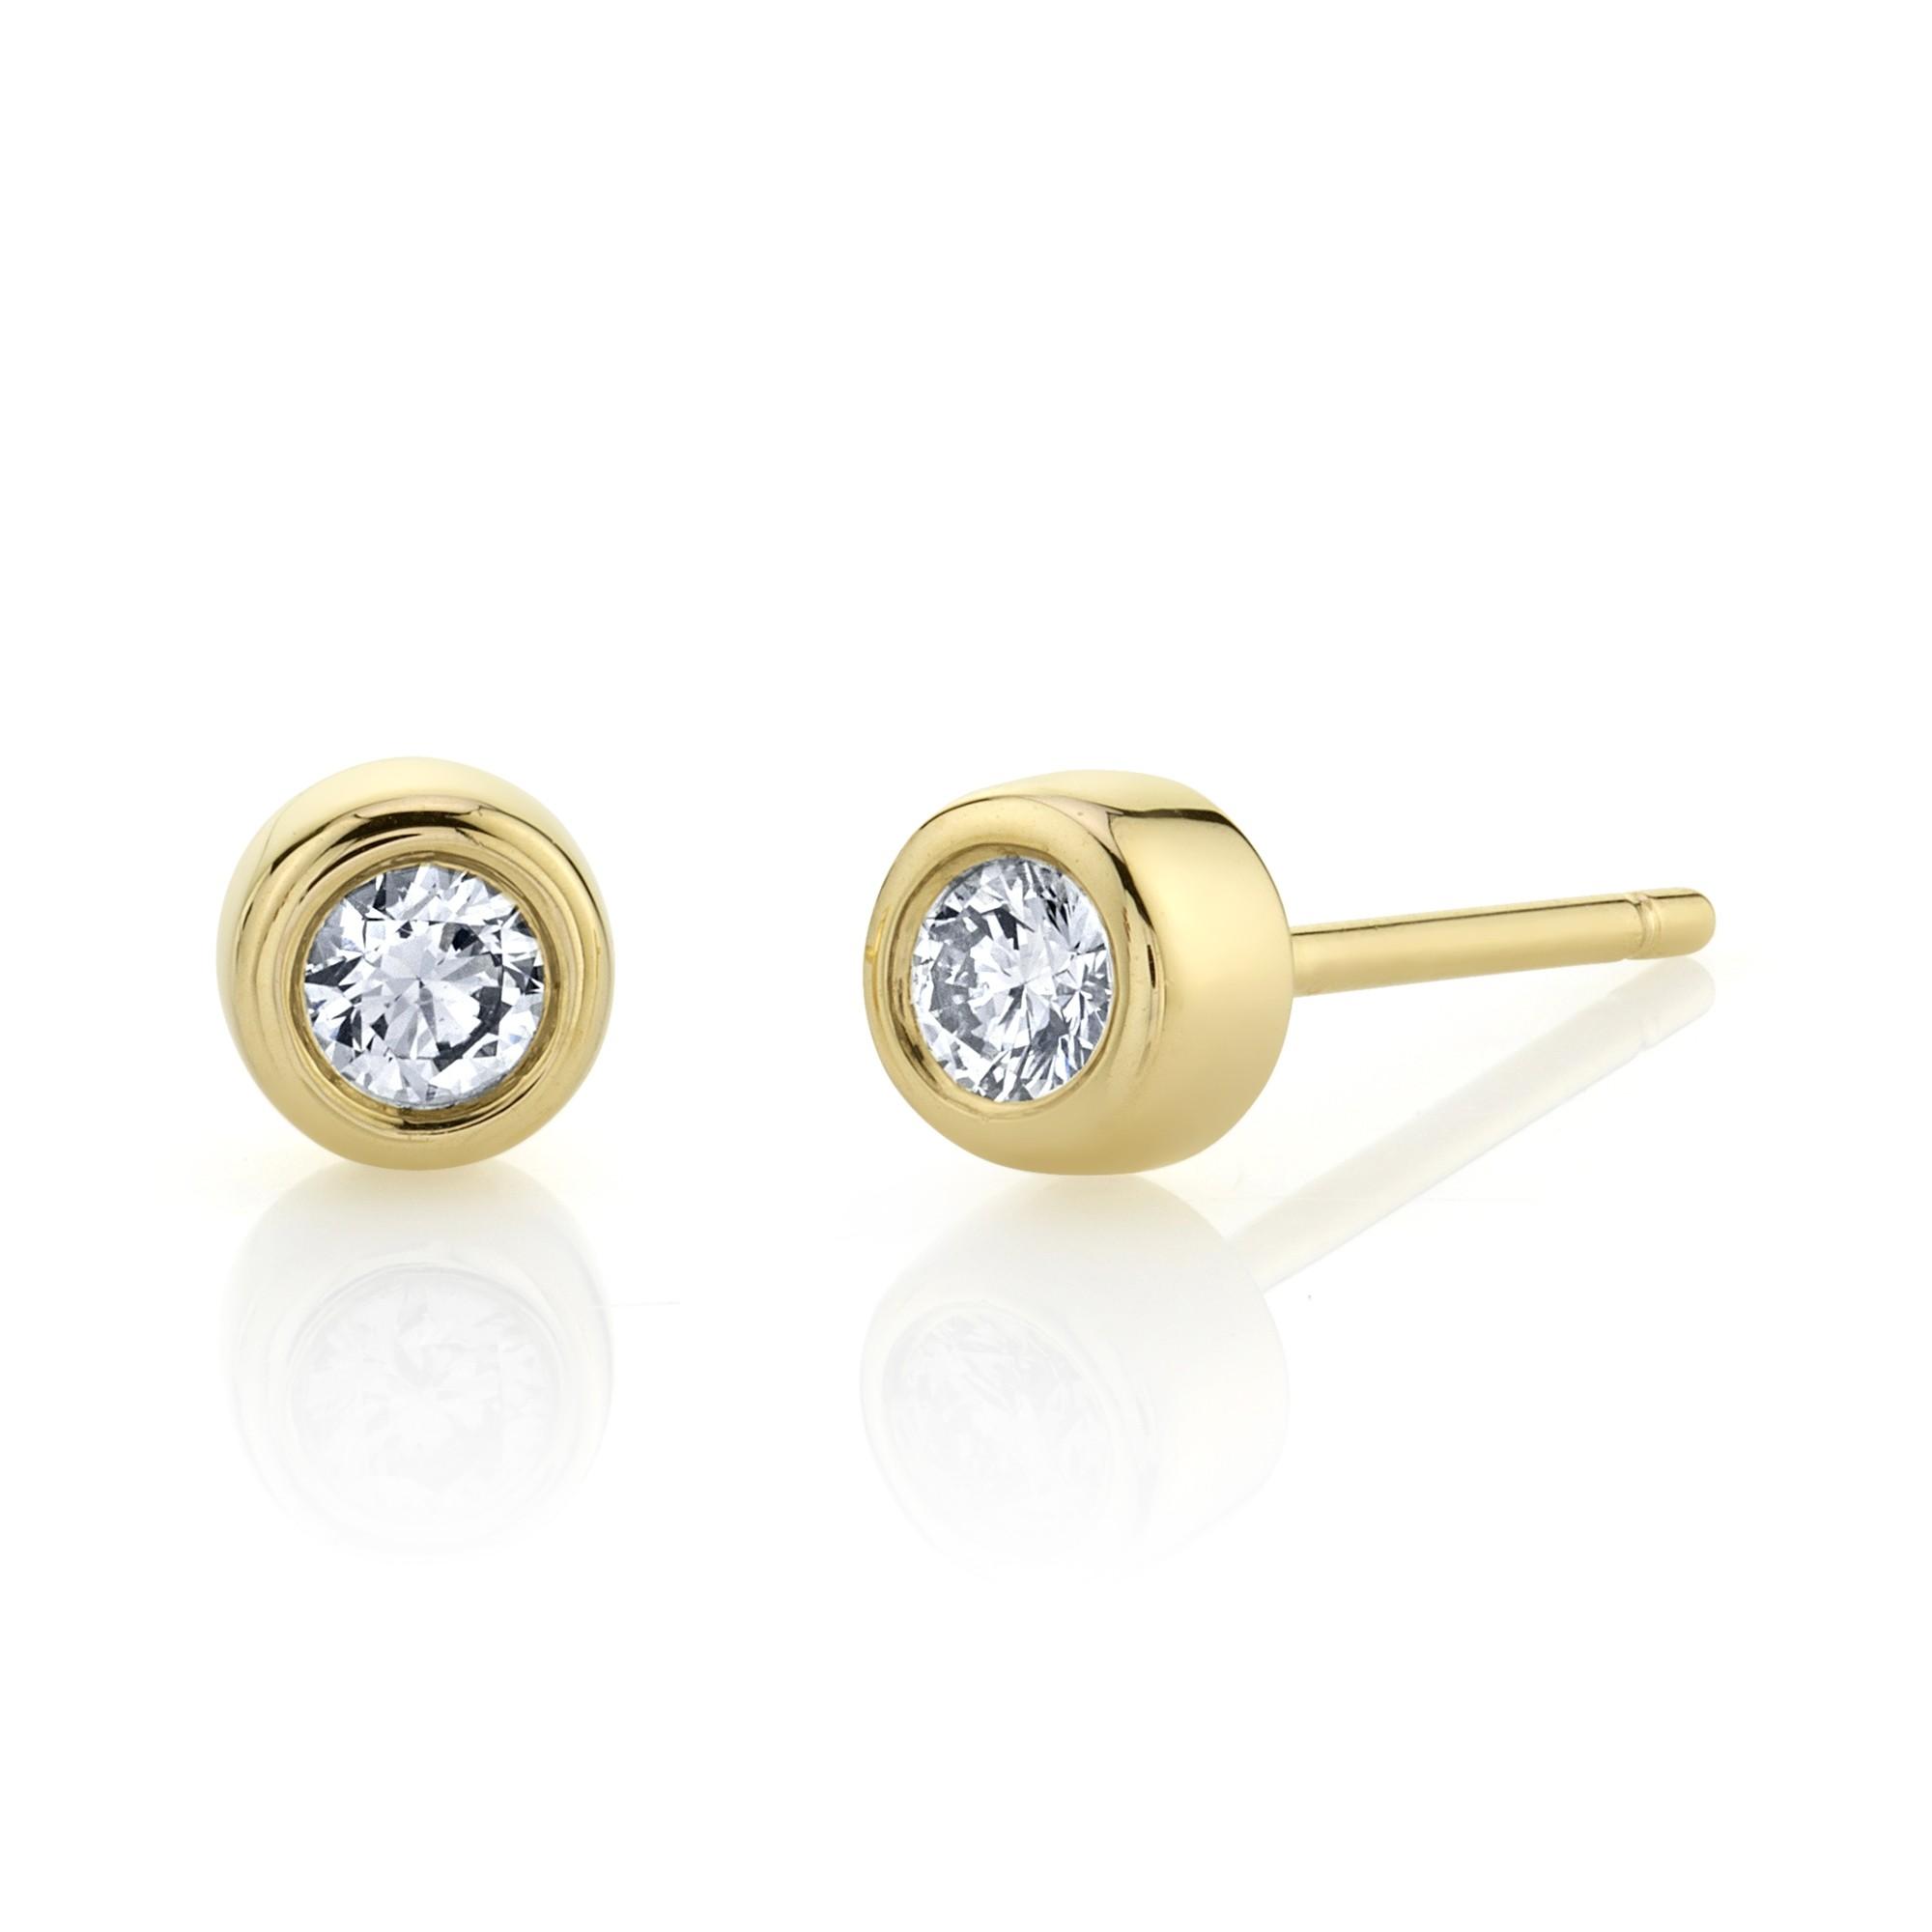 14k Yellow Gold Bezel Set Diamond Stud Earrings